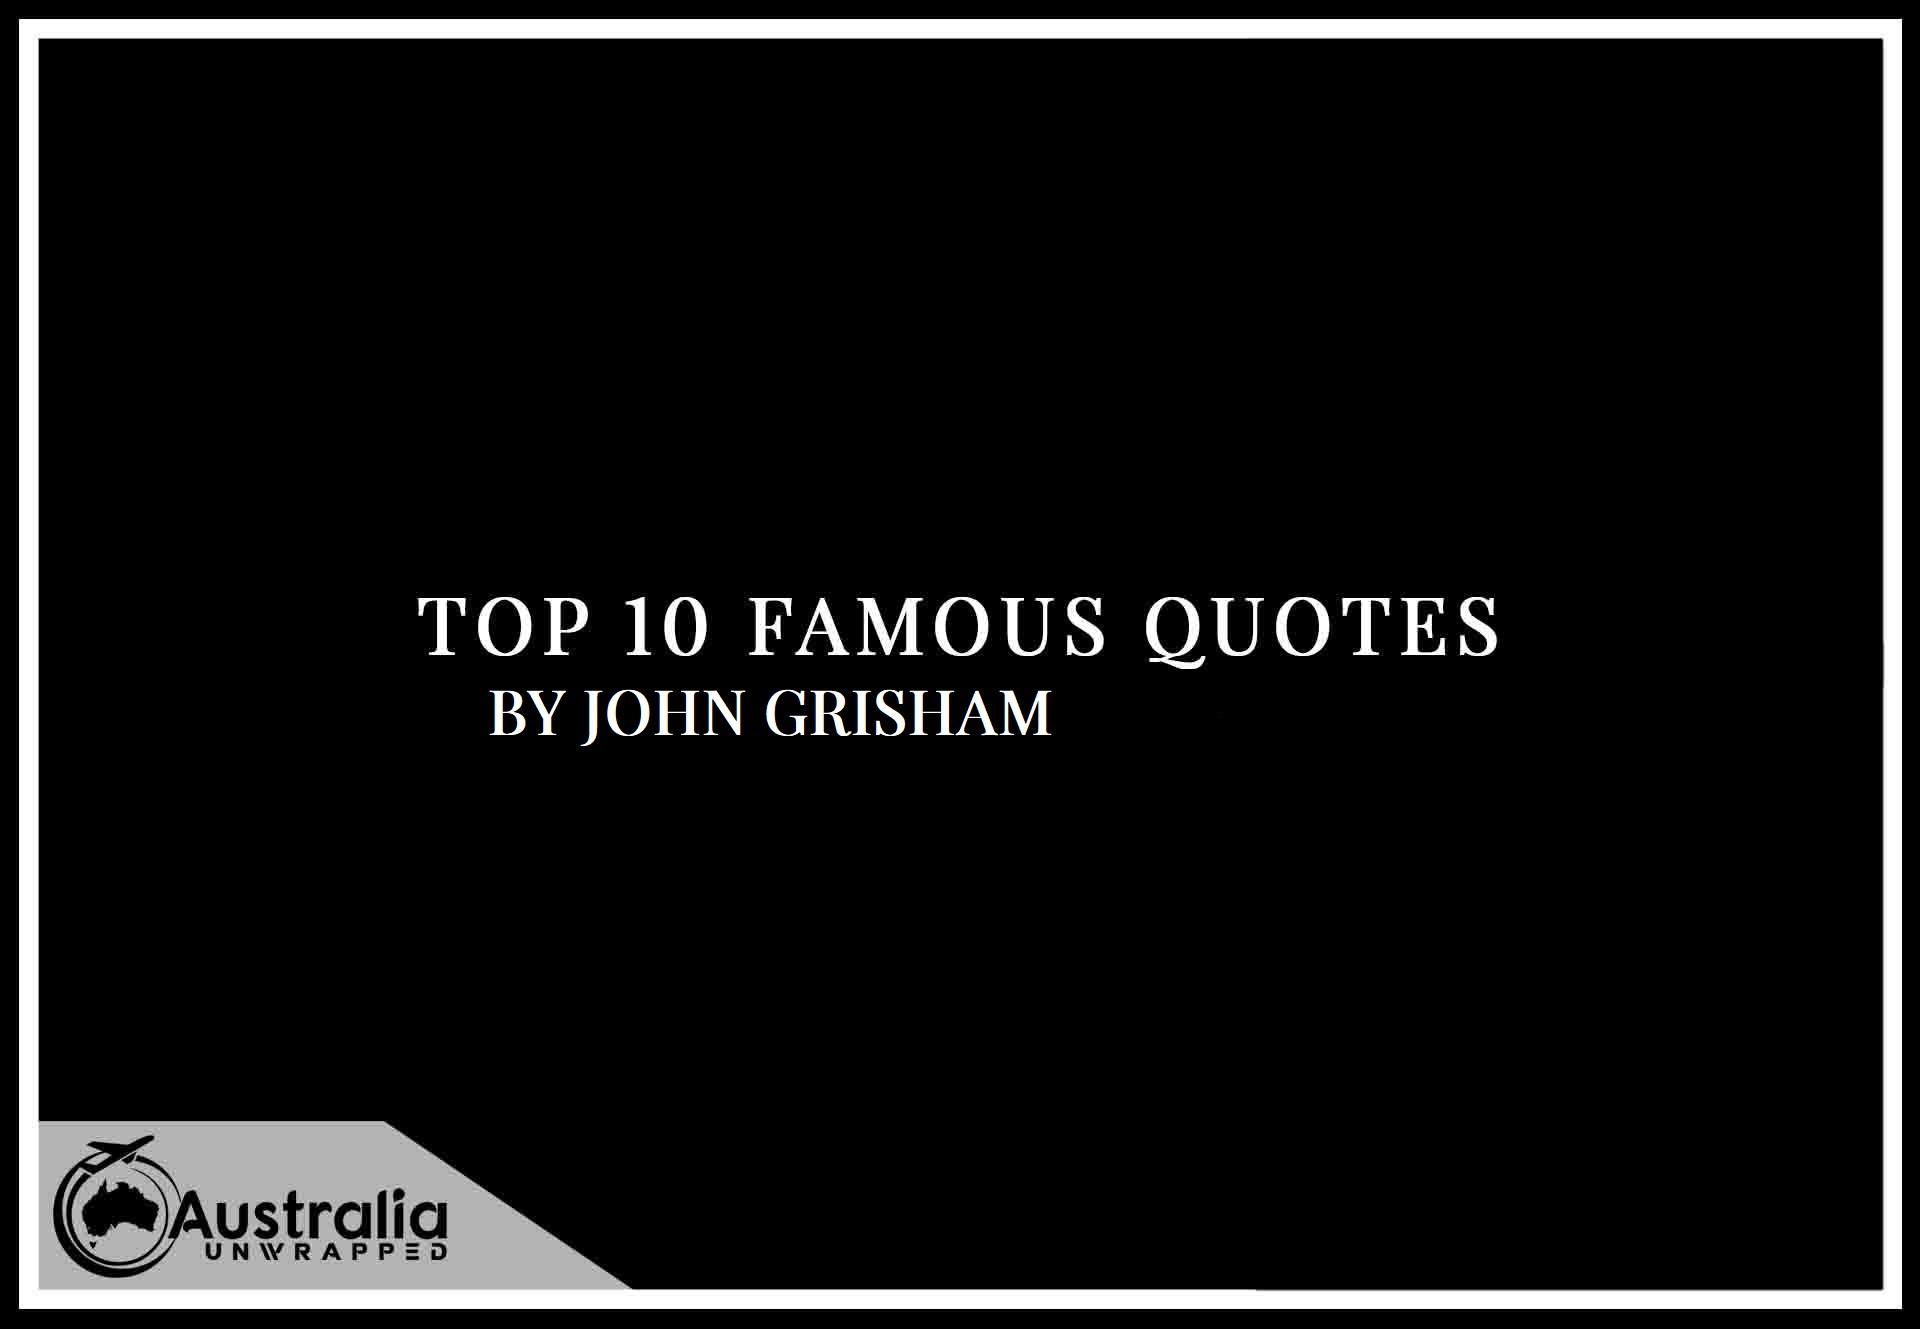 Top 10 Famous Quotes by Author John Grisham